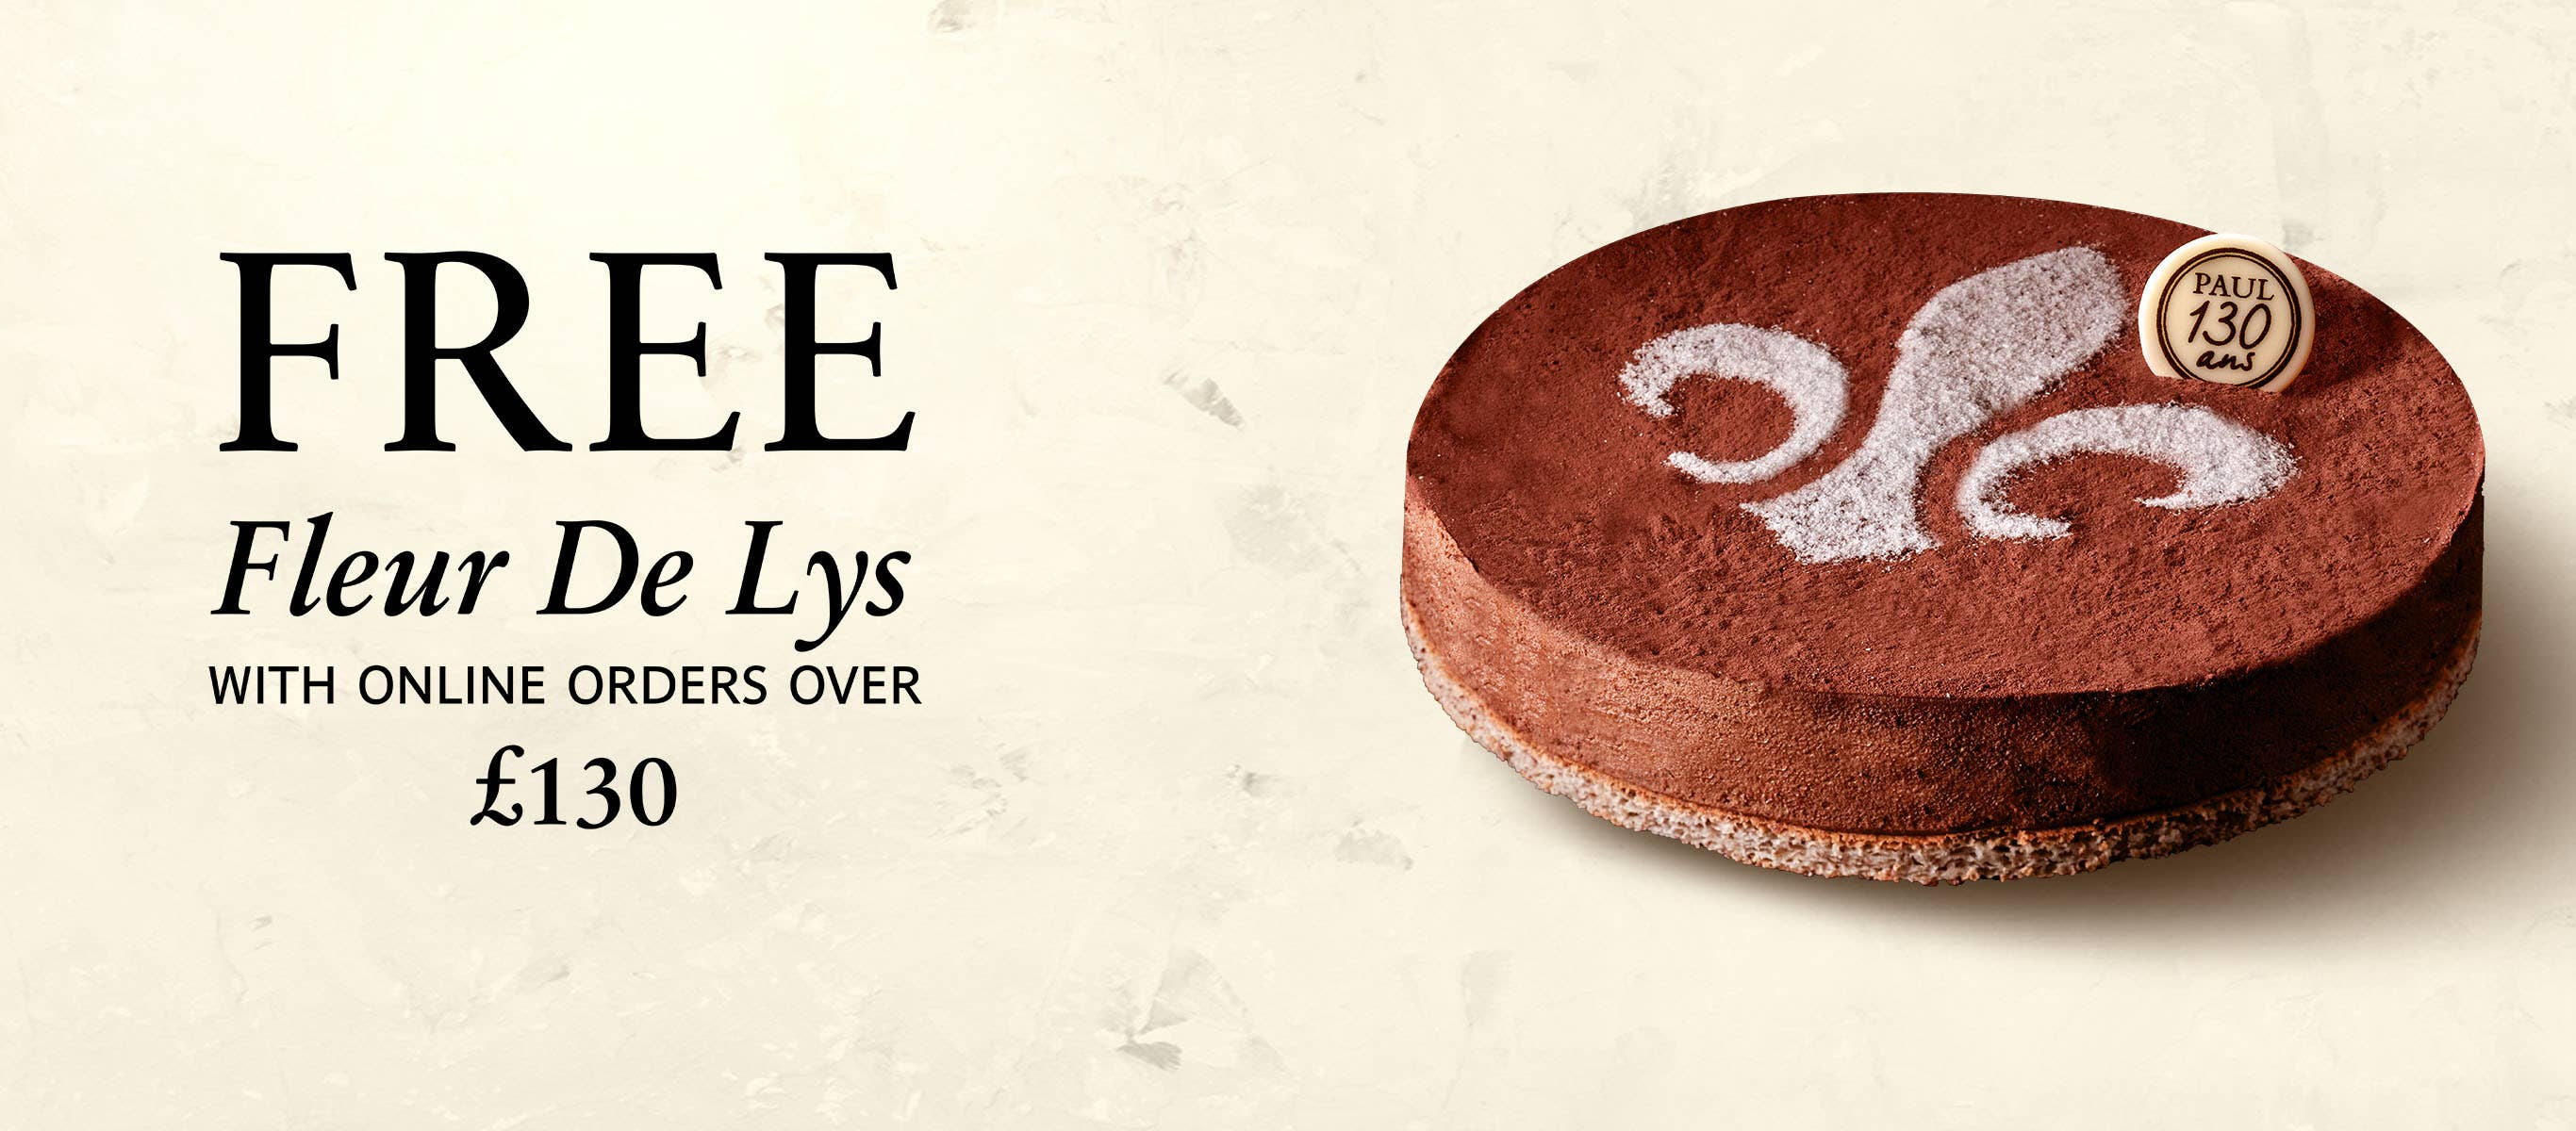 Spend 130, Free Cake